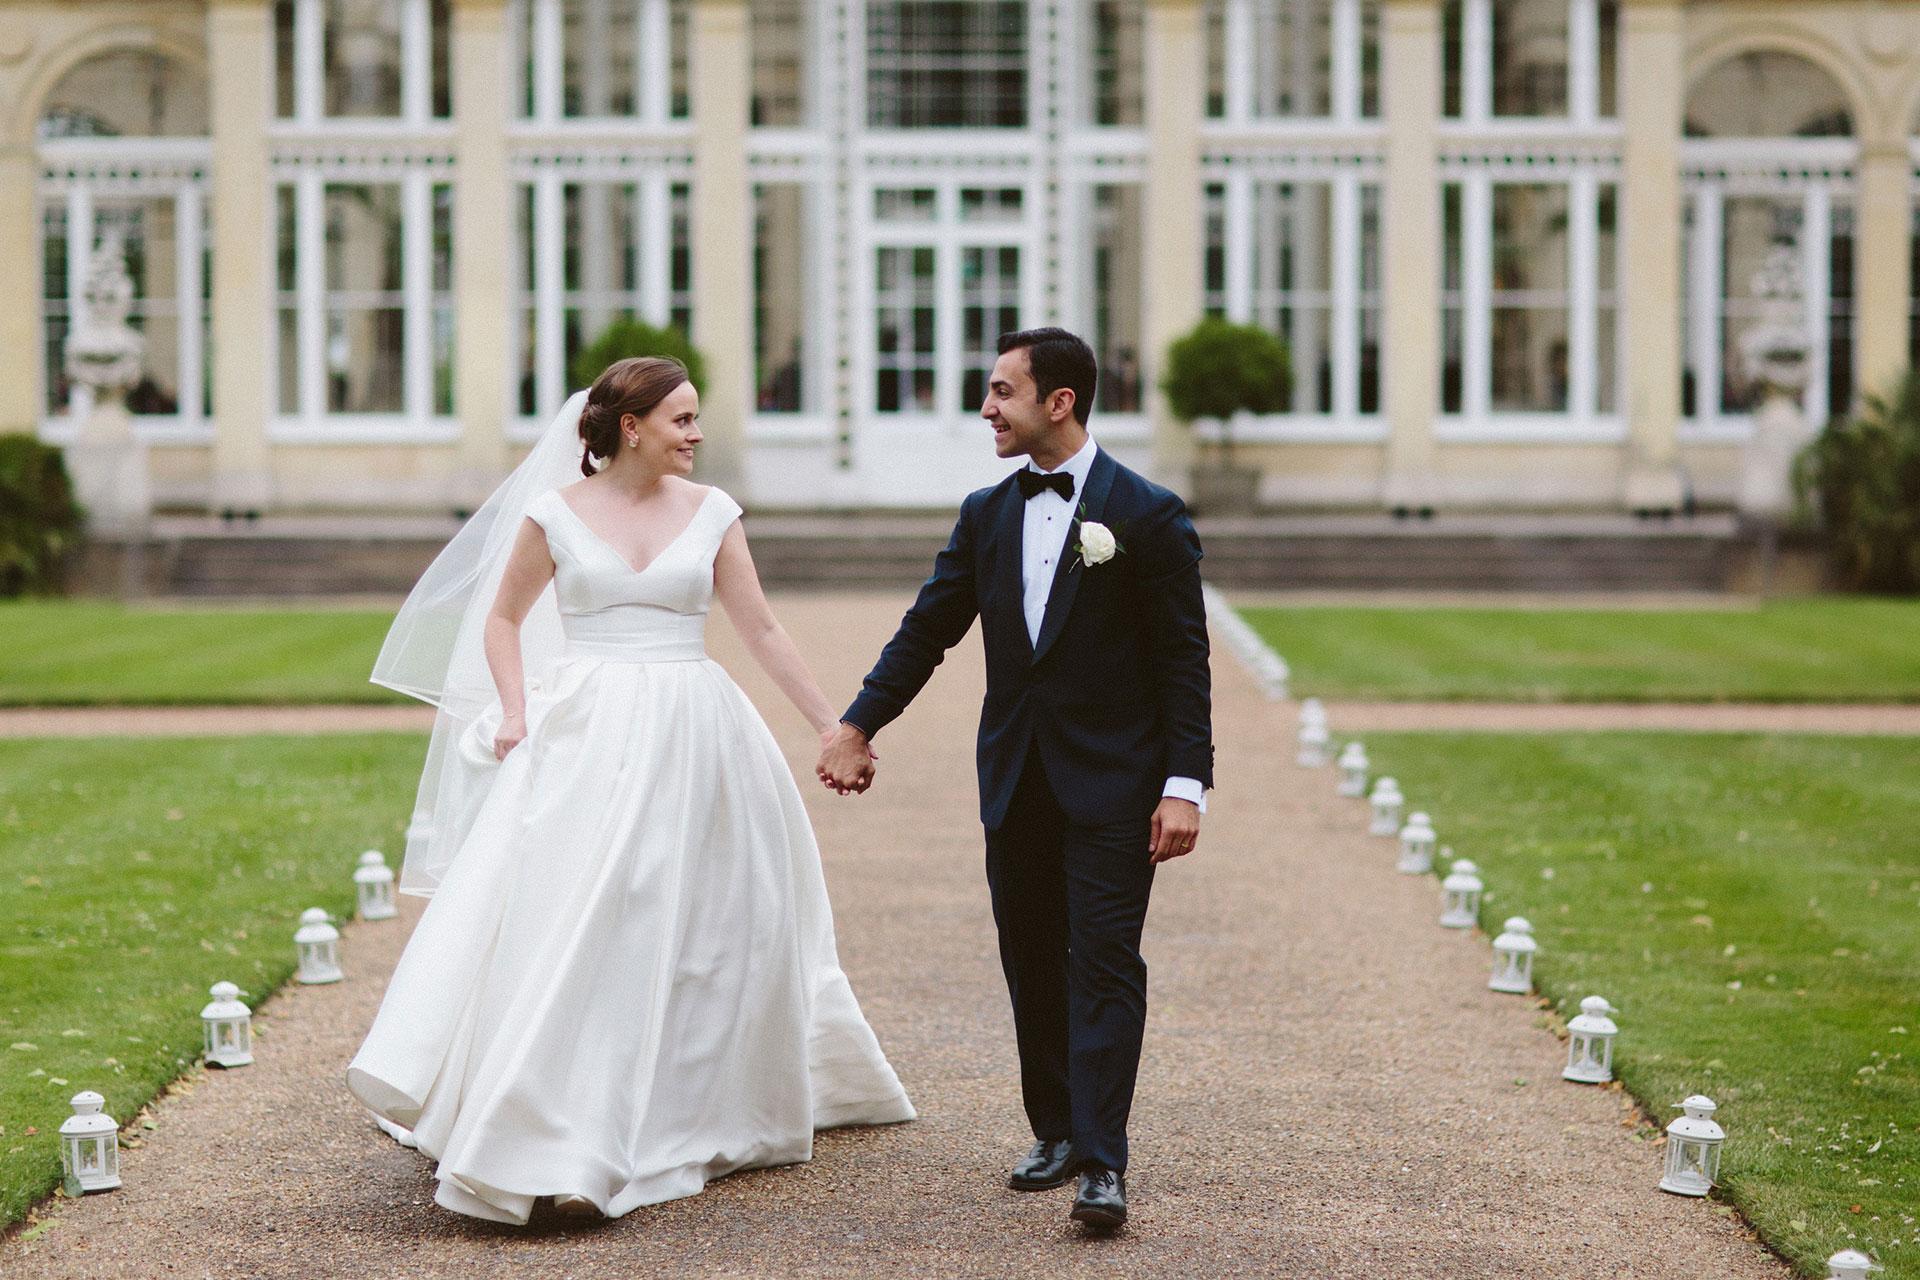 Syon-Park-Wedding-Photographer--_-Michael-Newington-Gray-433.jpg